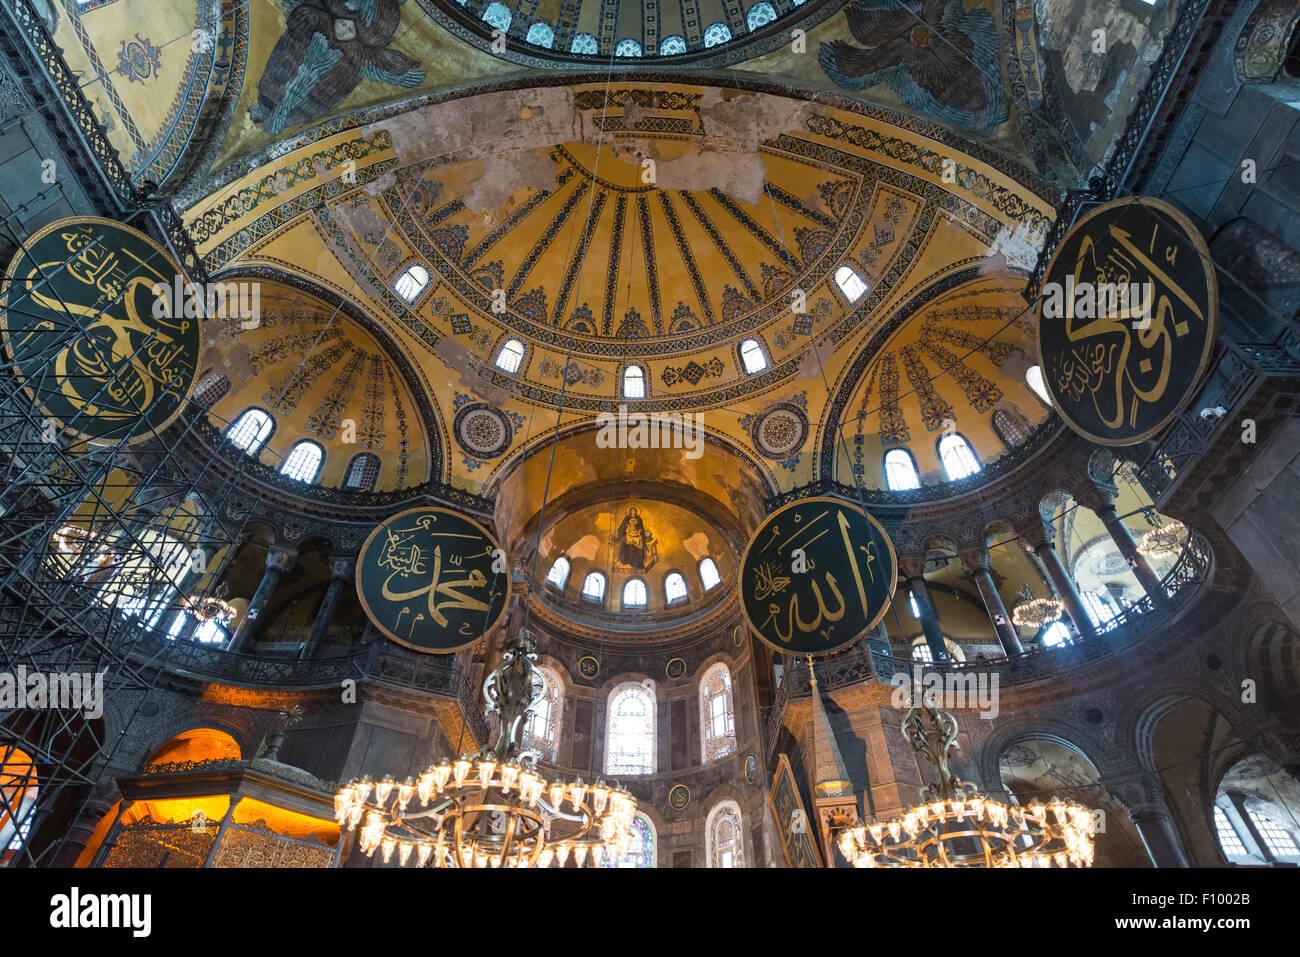 Zone principale de l'Hagia Sophia, Dome, Ayasofya, intérieur, UNESCO World Heritage Site, côté Photo Stock